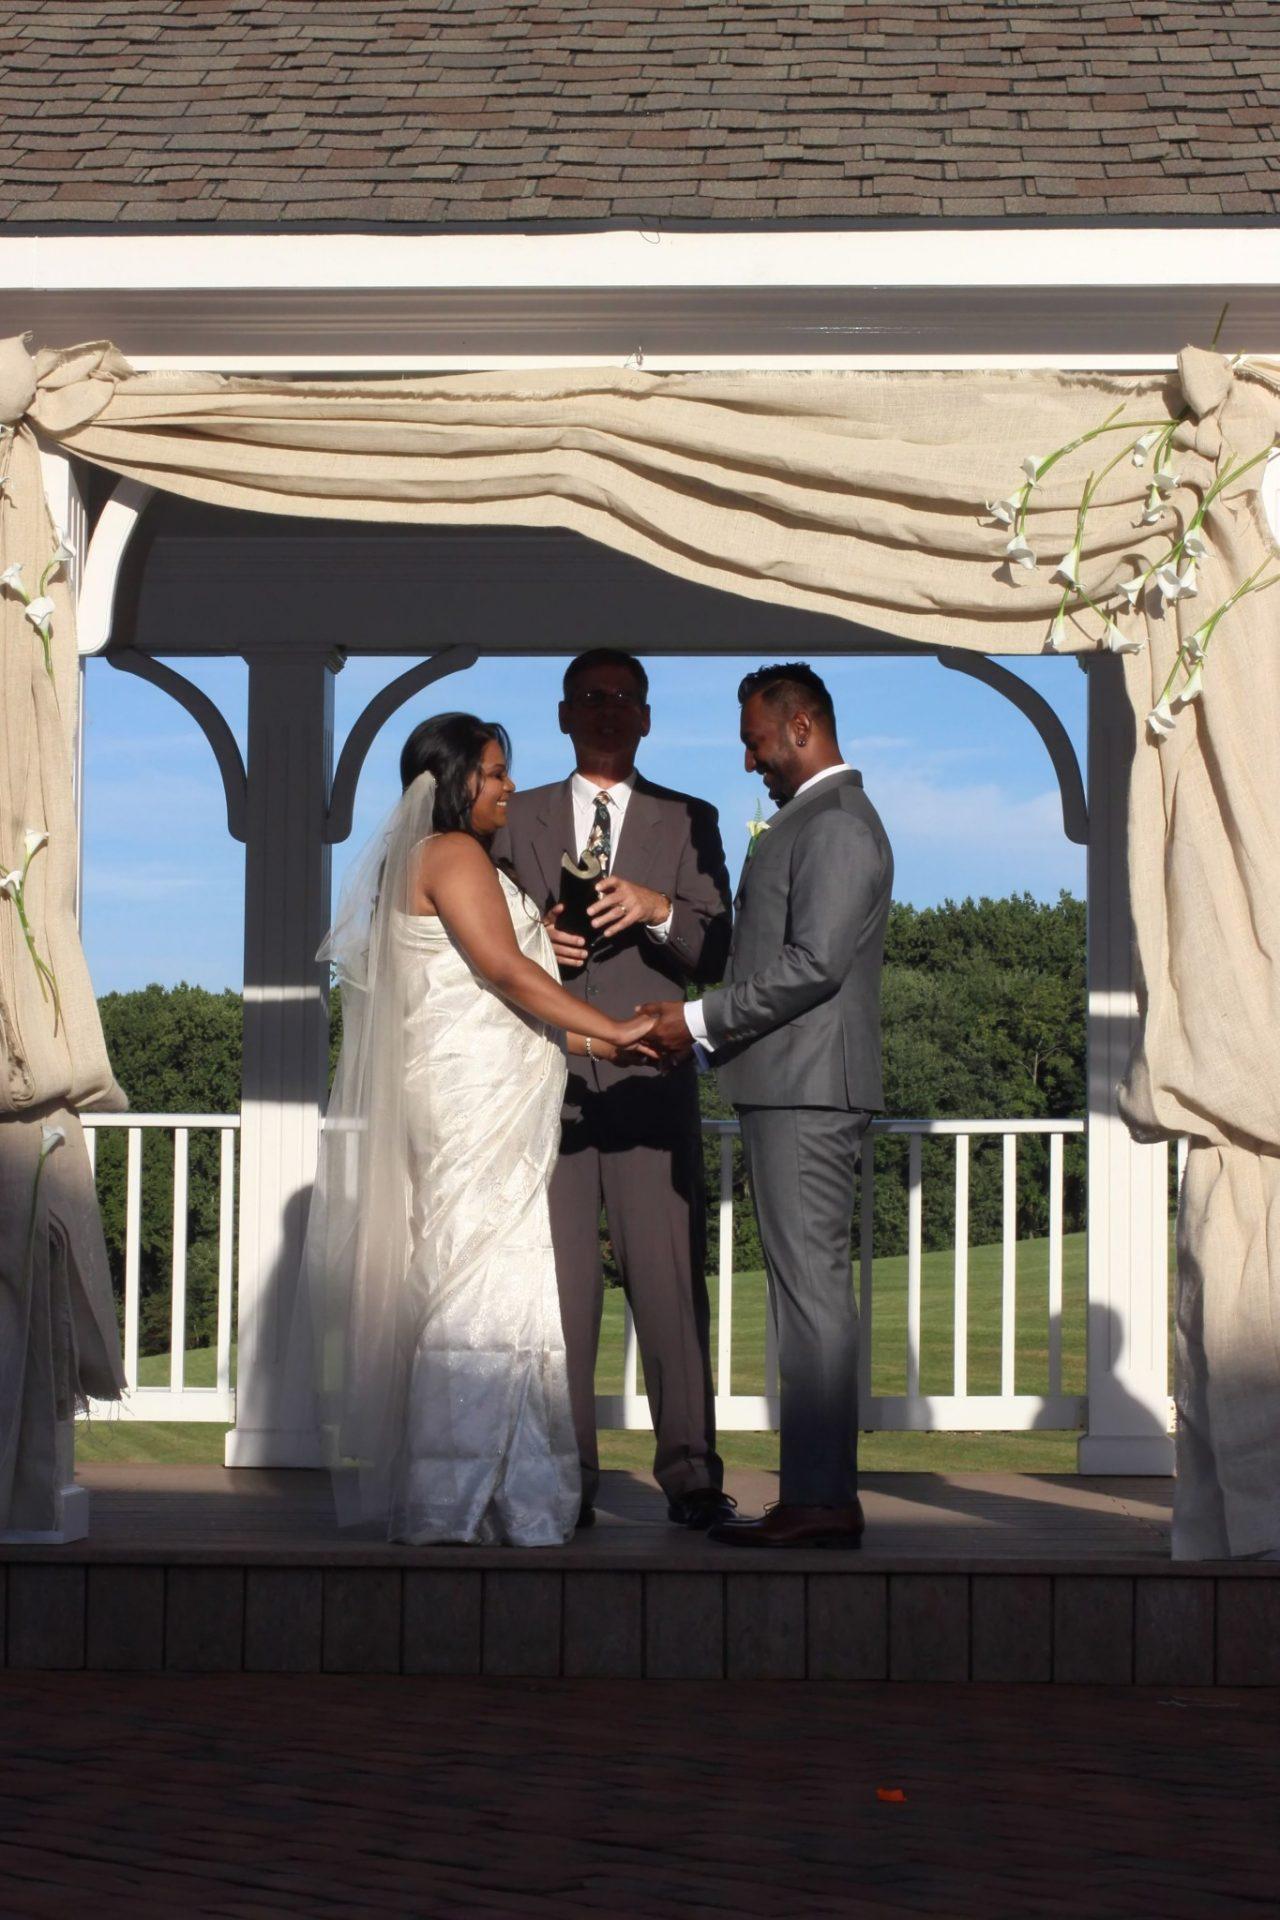 Bride and Groom on wedding pavilion